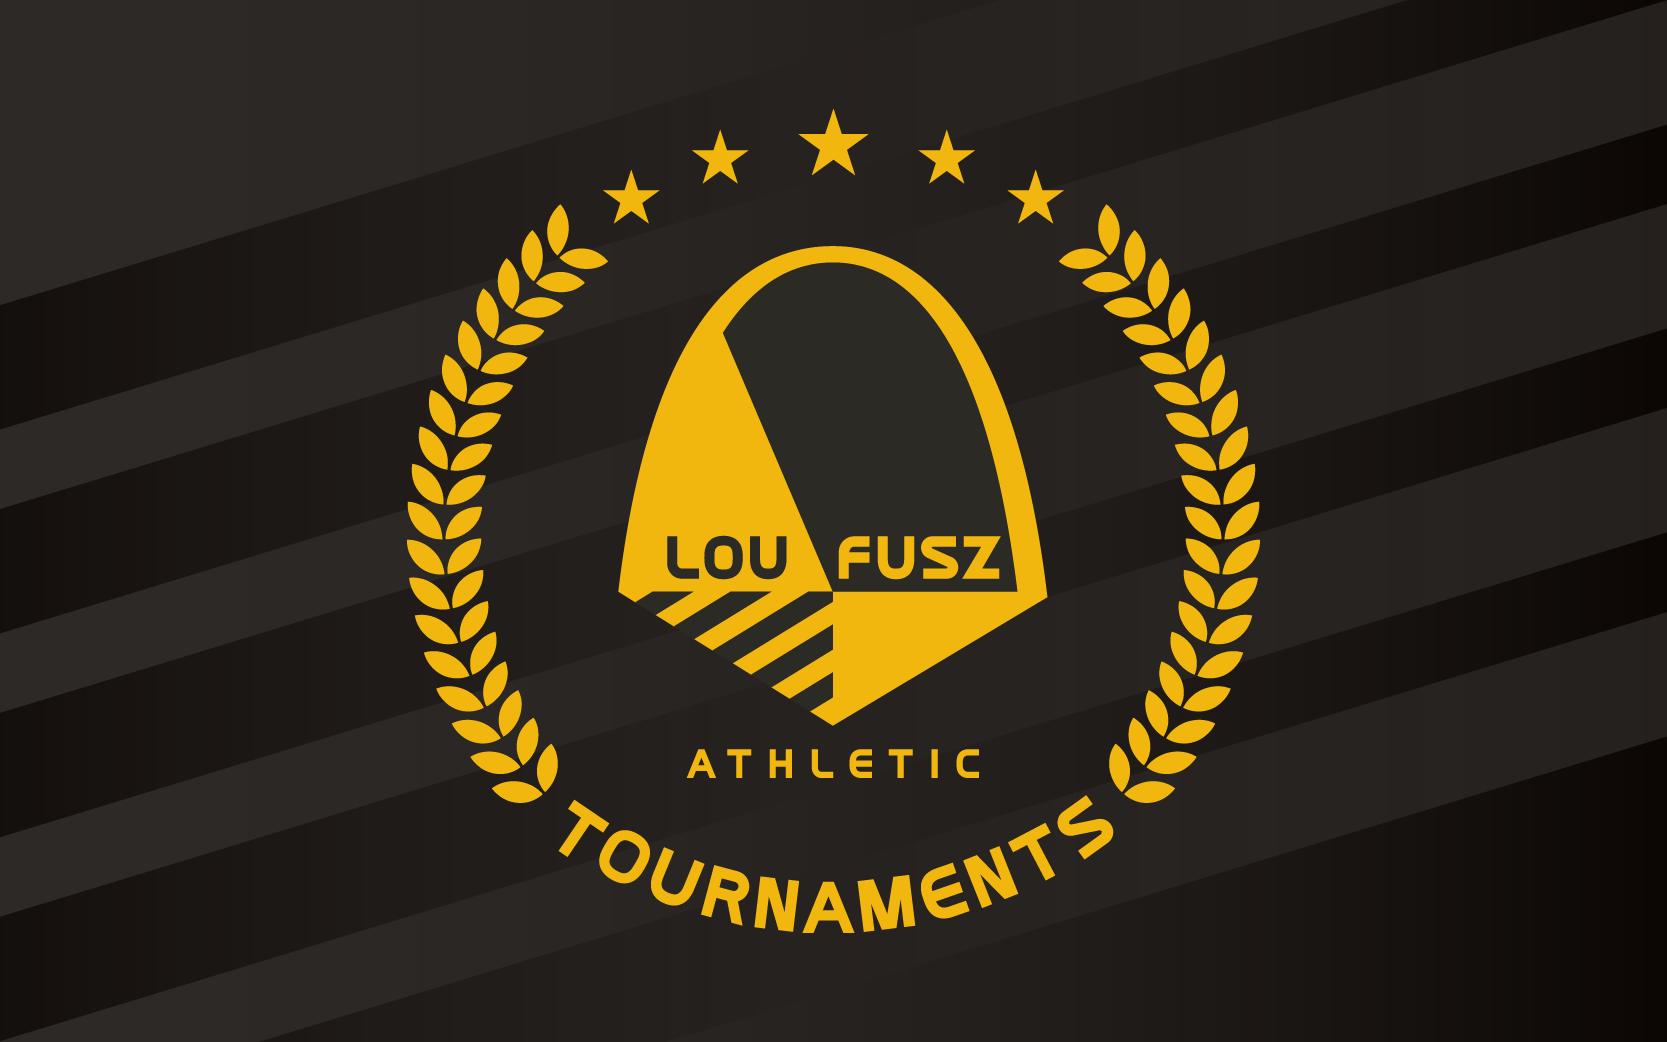 Athletic_SmallHero_Tournaments